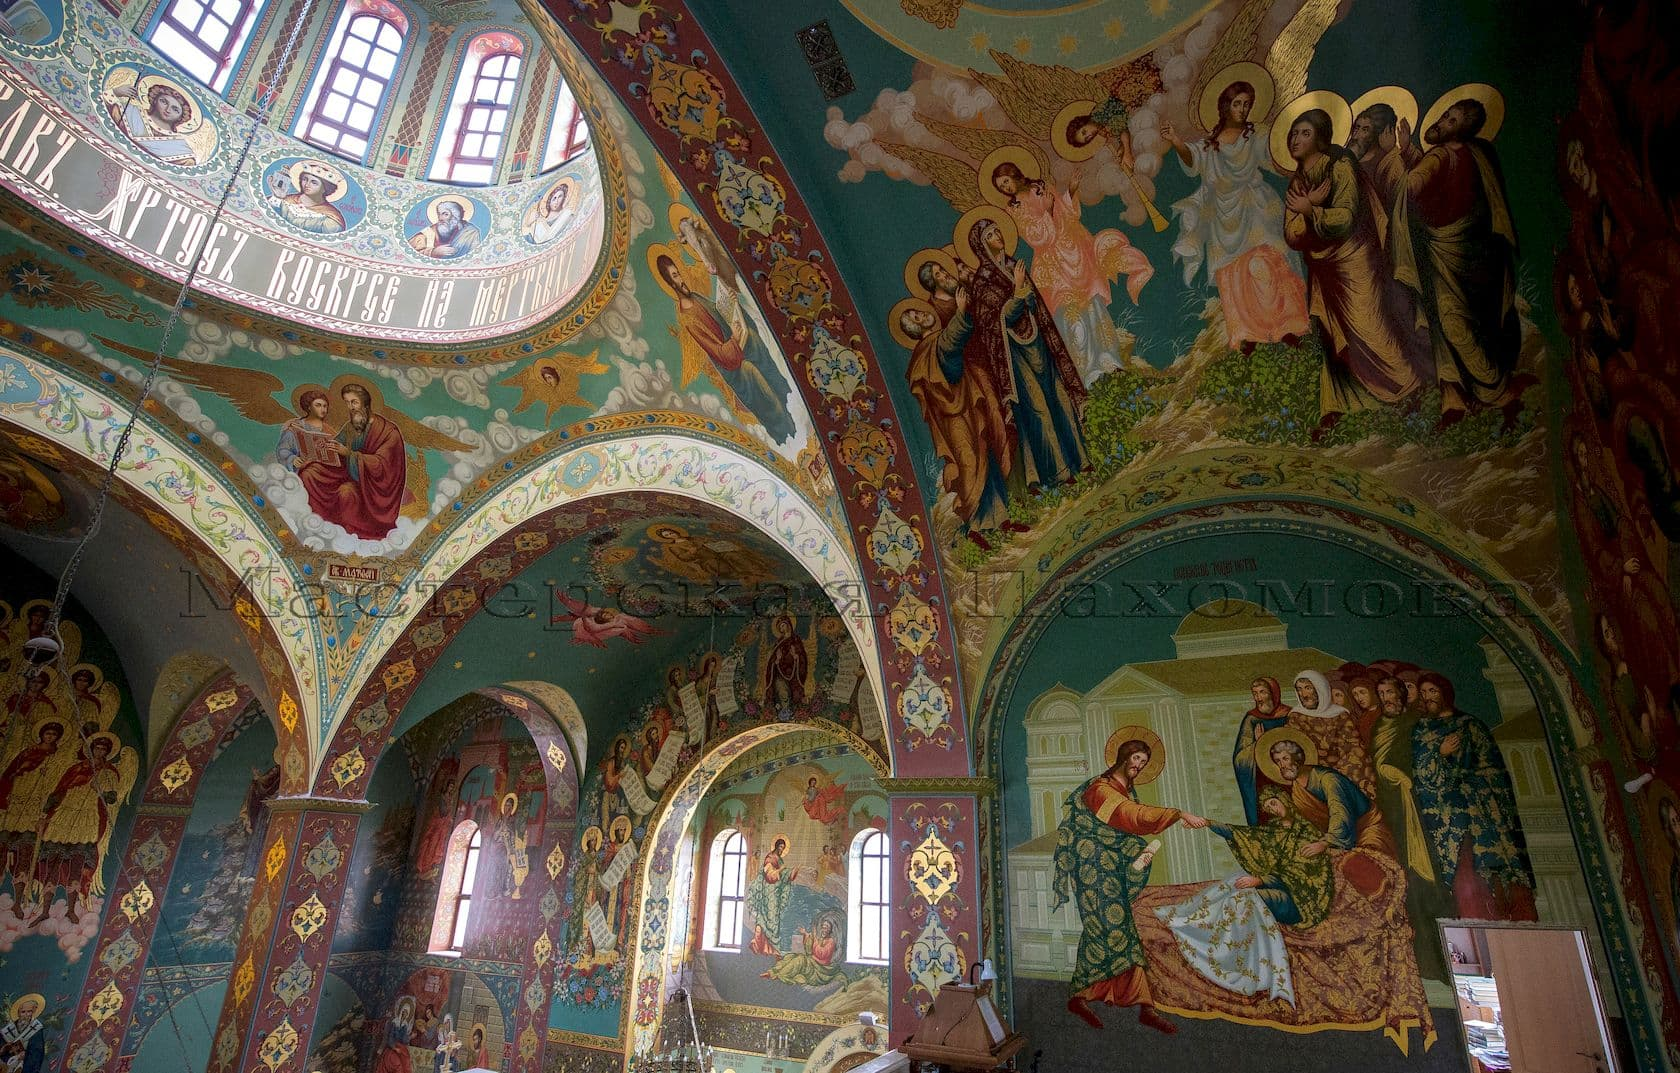 Росписи стен Храма Христа Спасителя в г. Пятигорске